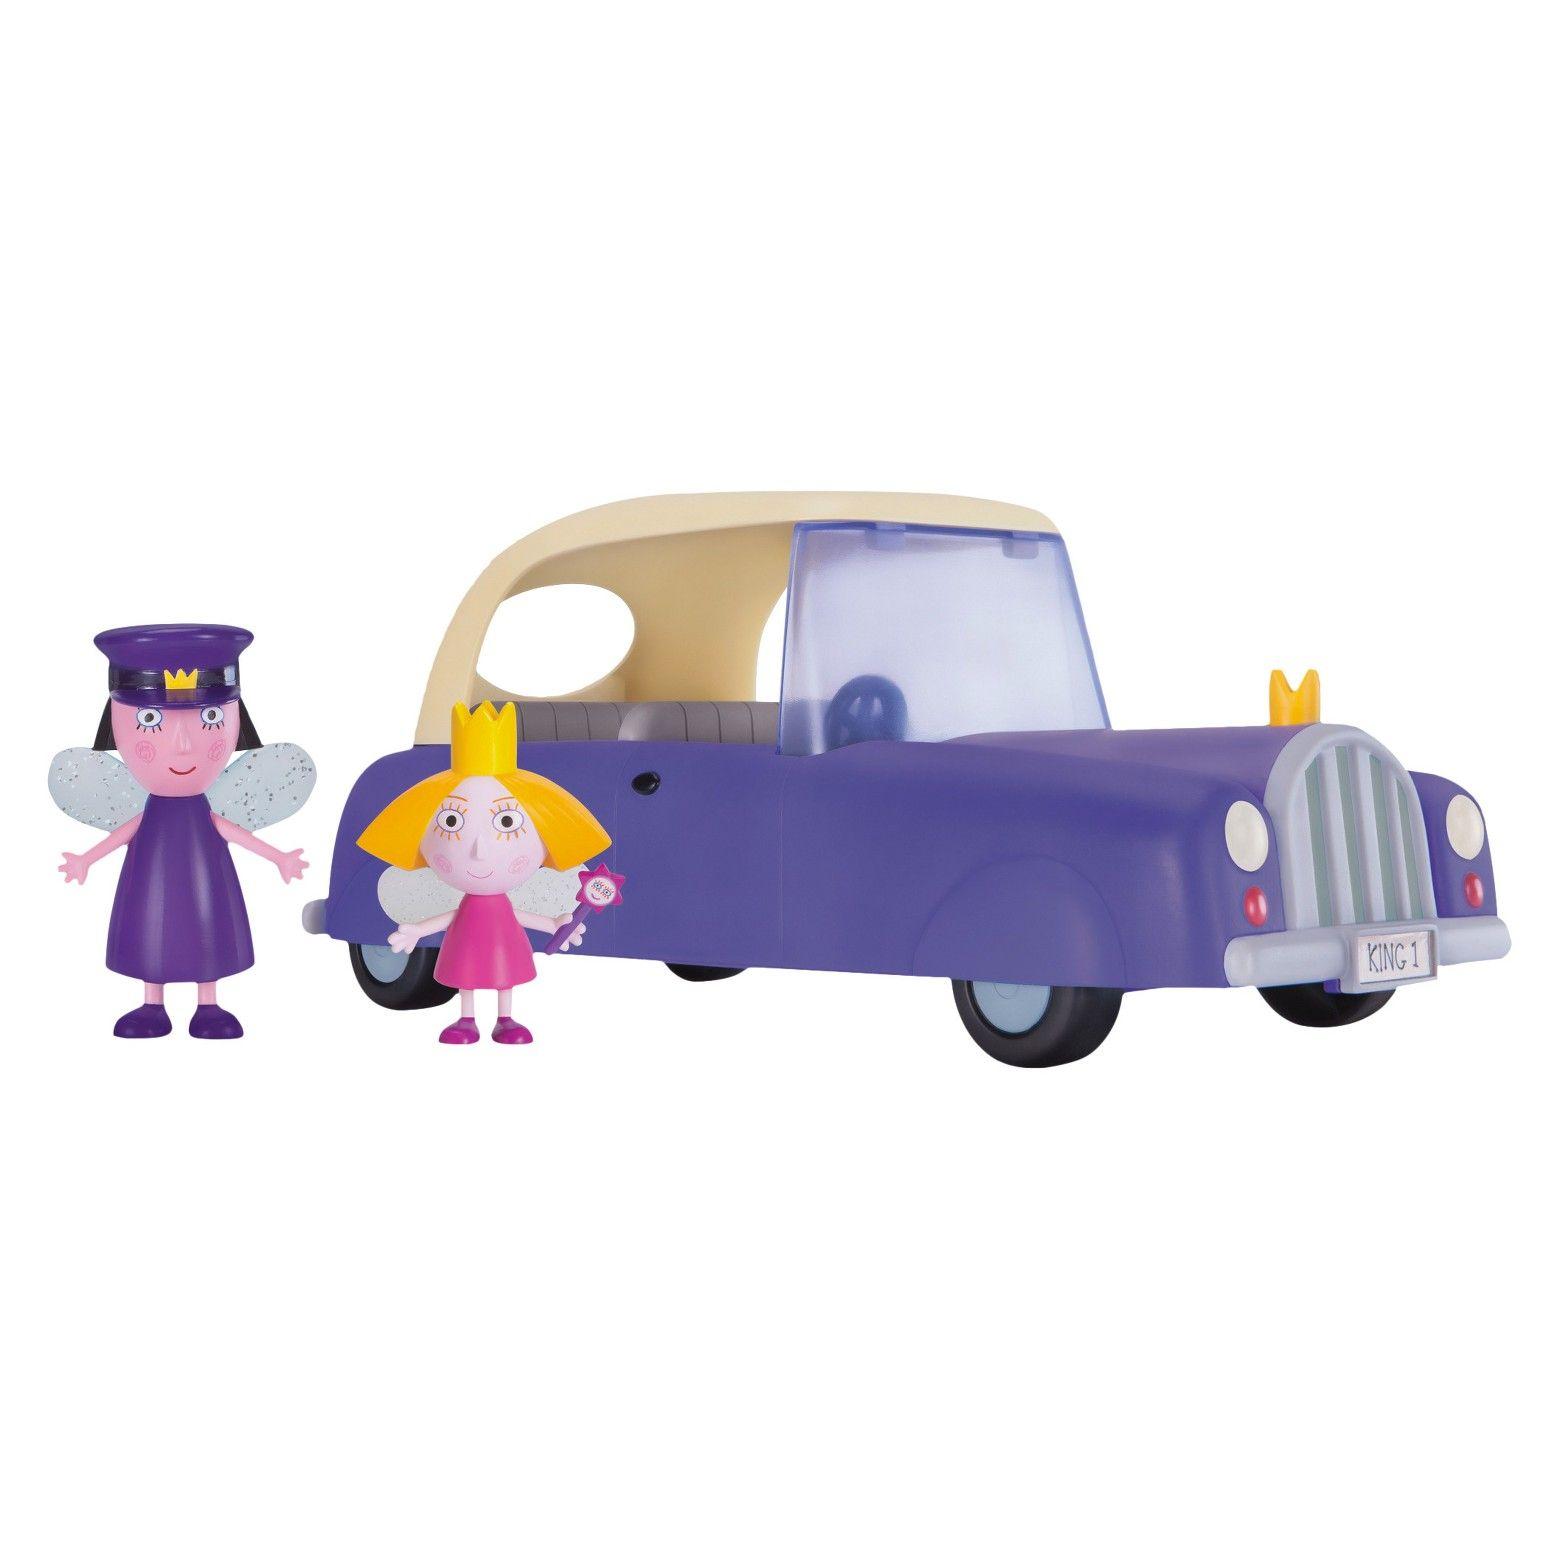 Little car toys  Ben u Hollyus Royal Car Feature Vehicle